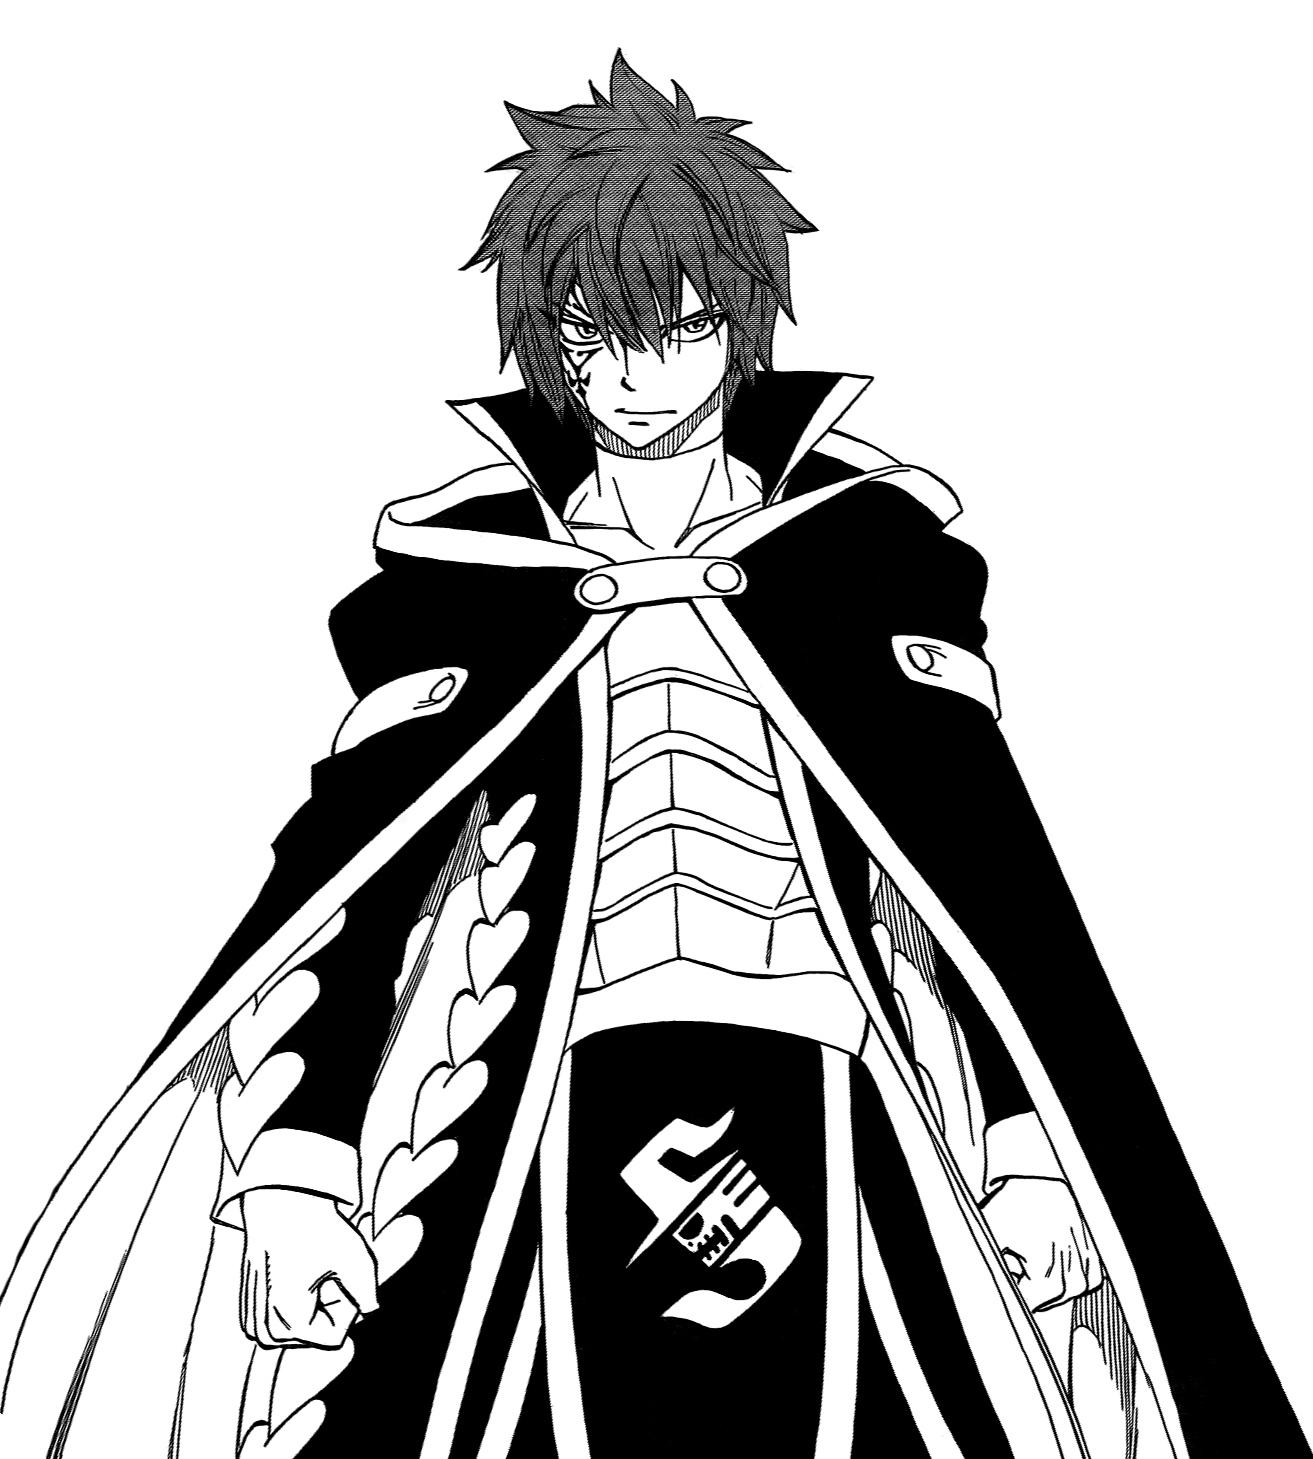 Fairy Tail Manga Drawing | Free download best Fairy Tail Manga